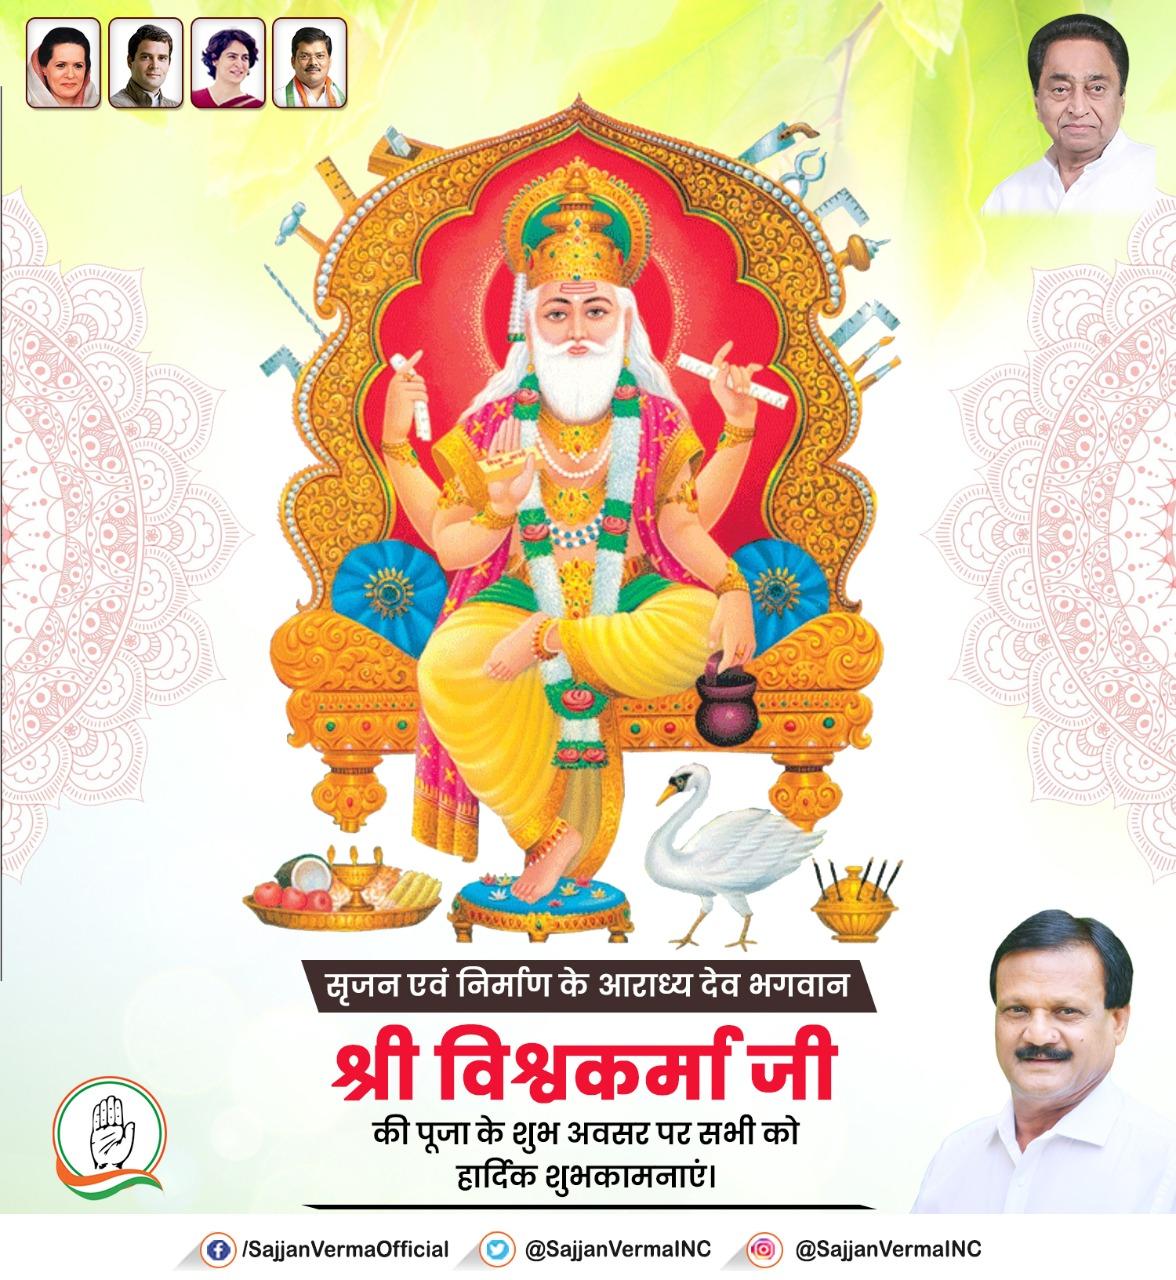 #VishwakarmaPuja2020 Photo